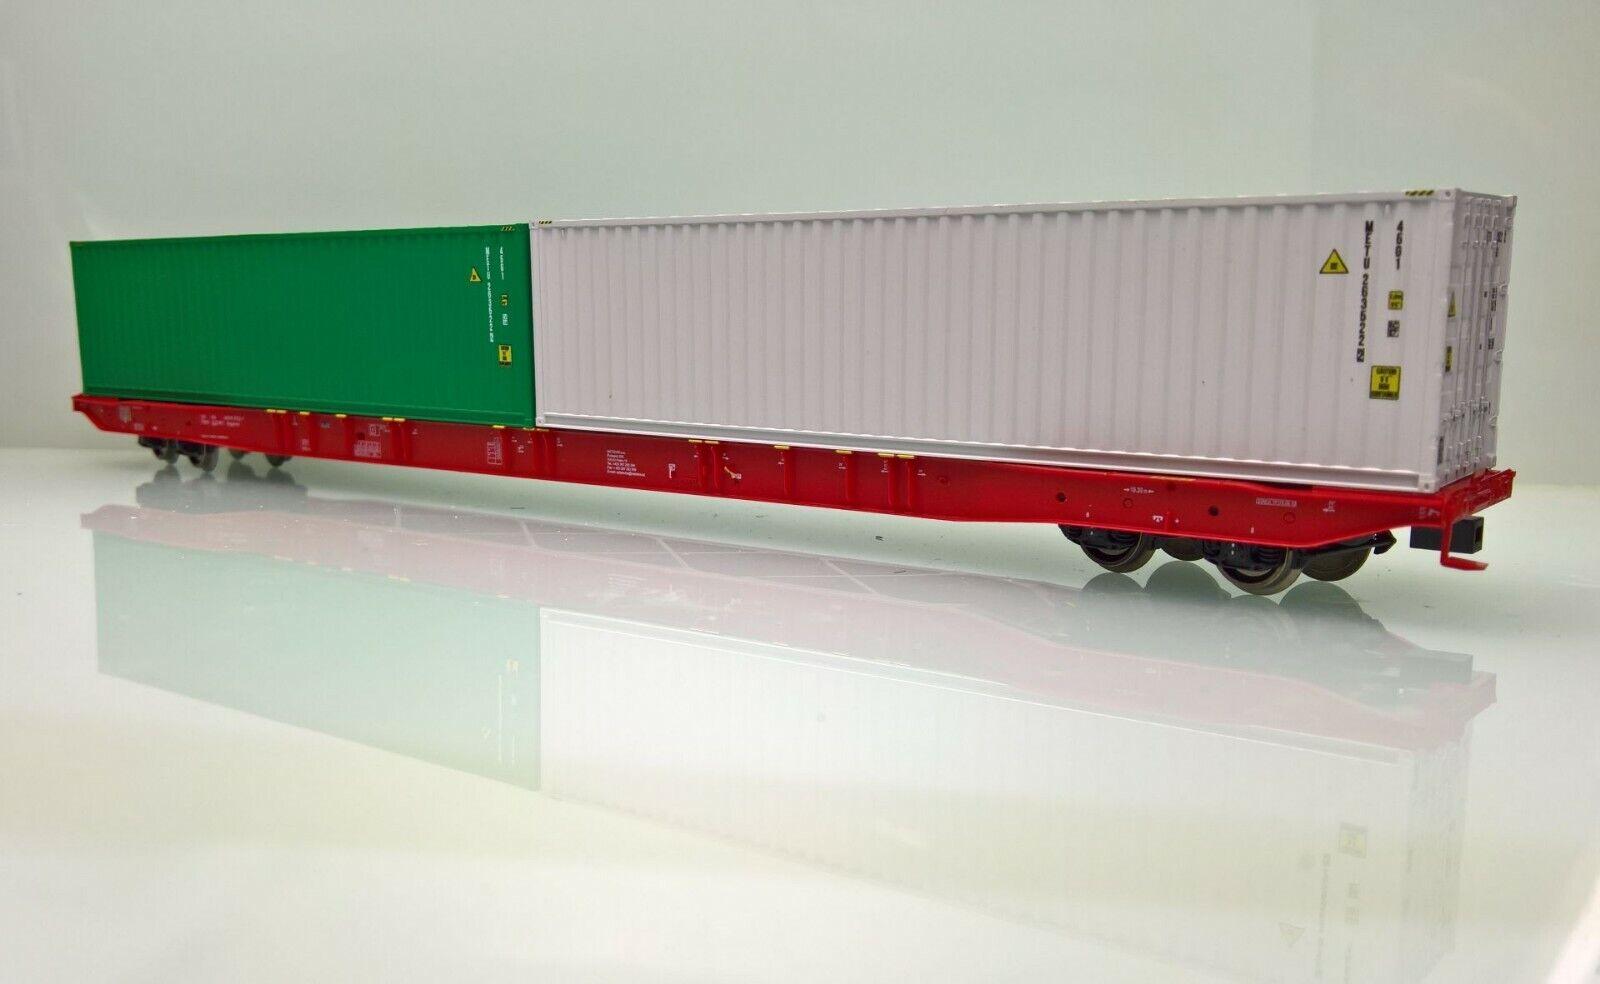 Igra modellolo 96010002 container autorello portante sggnss 80' CZMT Metrans EP. vi NUOVO OVP